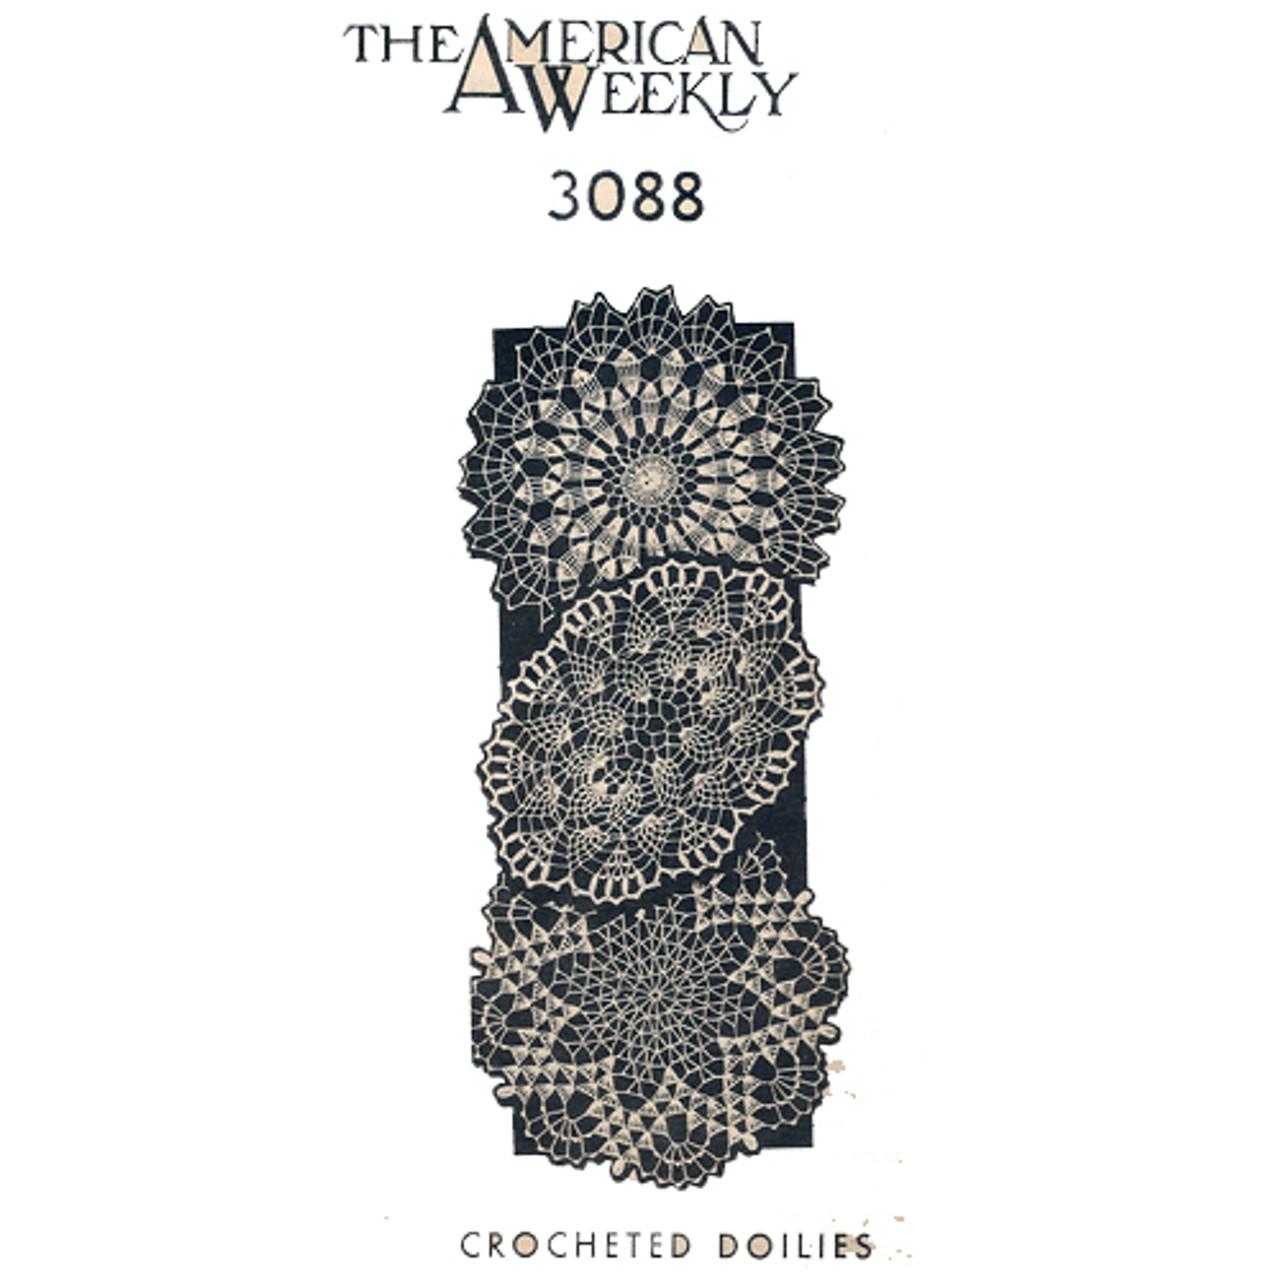 Three Vintage Crochet Doilies Pattern American Weekly 3088